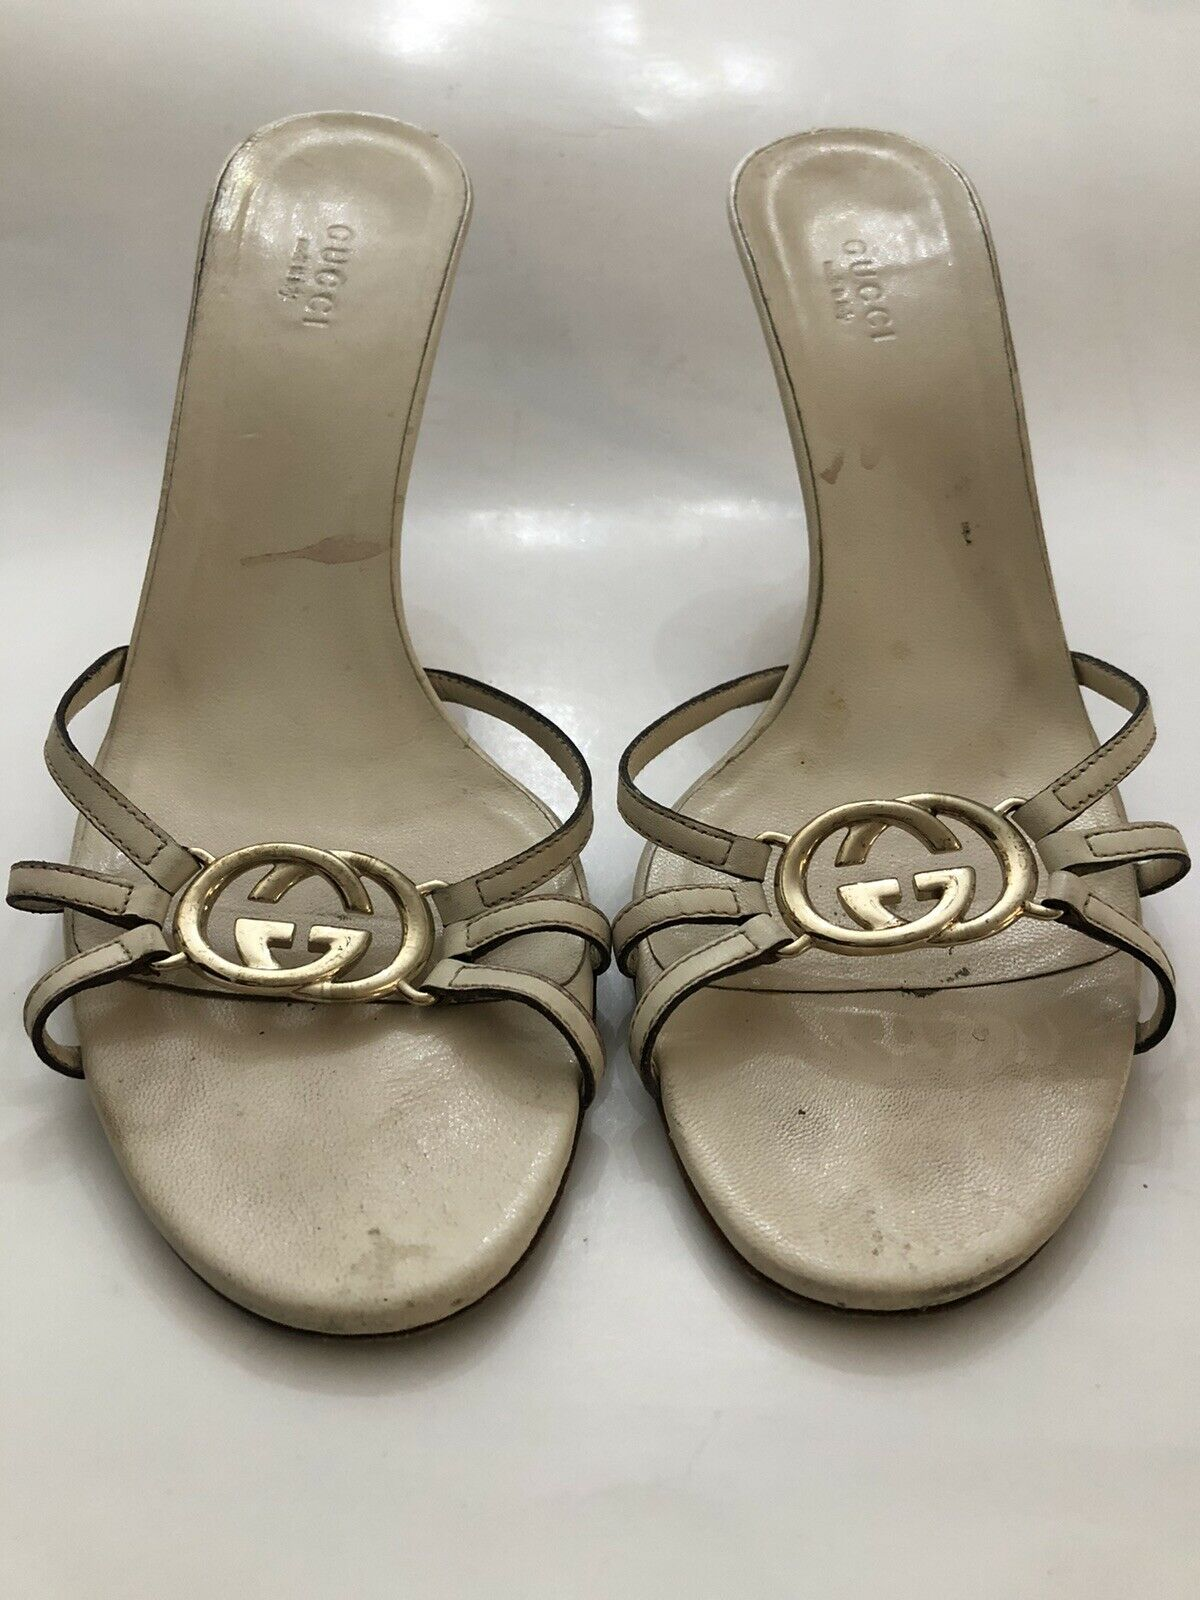 Gucci Off White Women Shoe 8B  - image 2